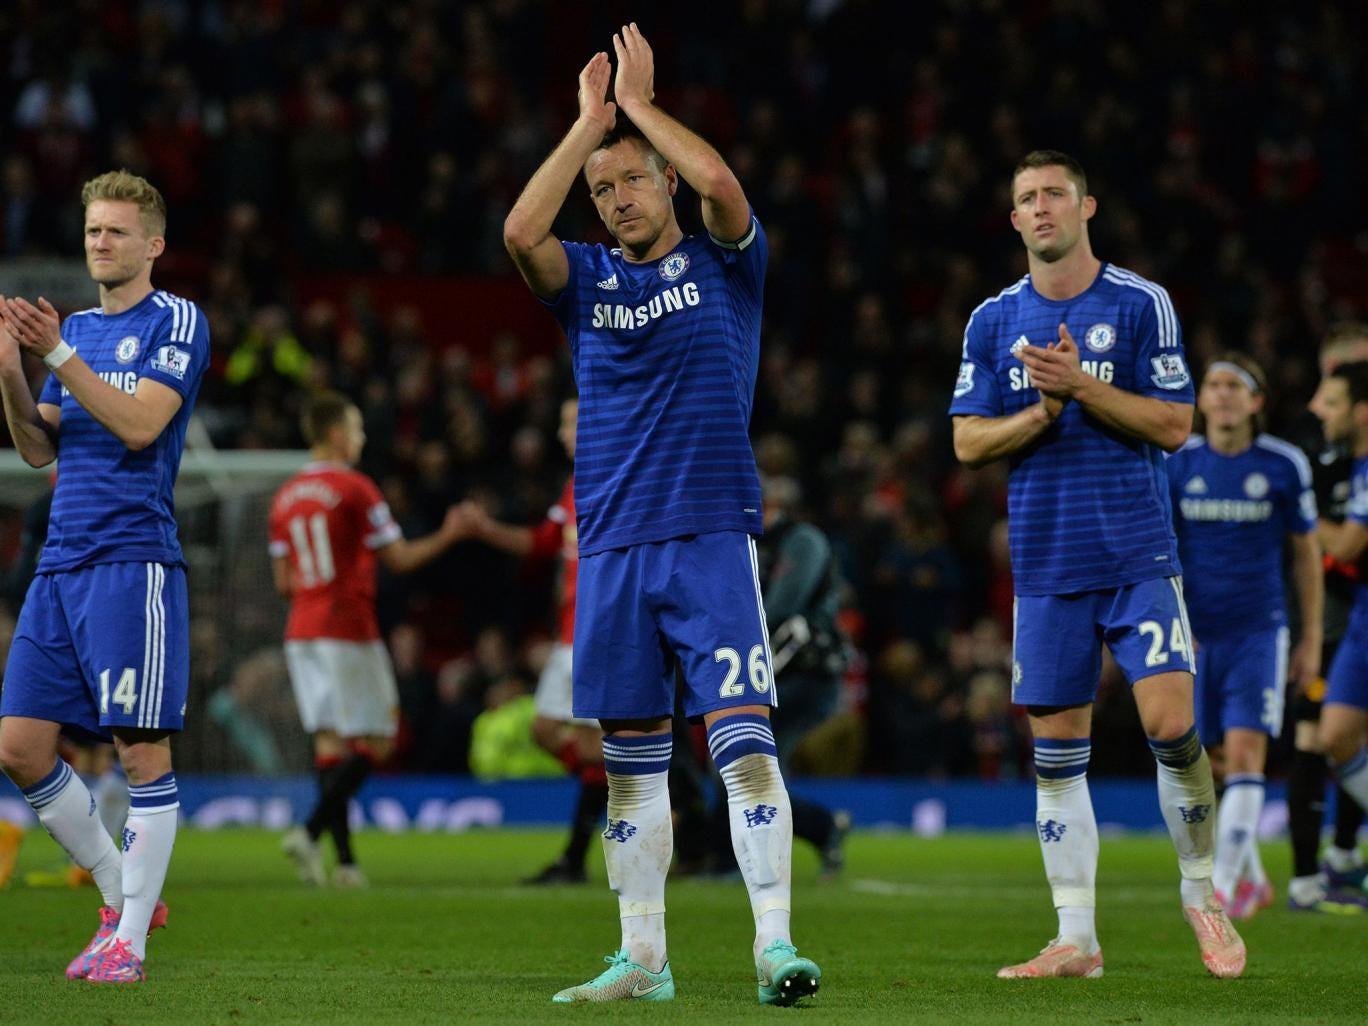 Captain of Chelsea 2014 Chelsea Captain John Terry